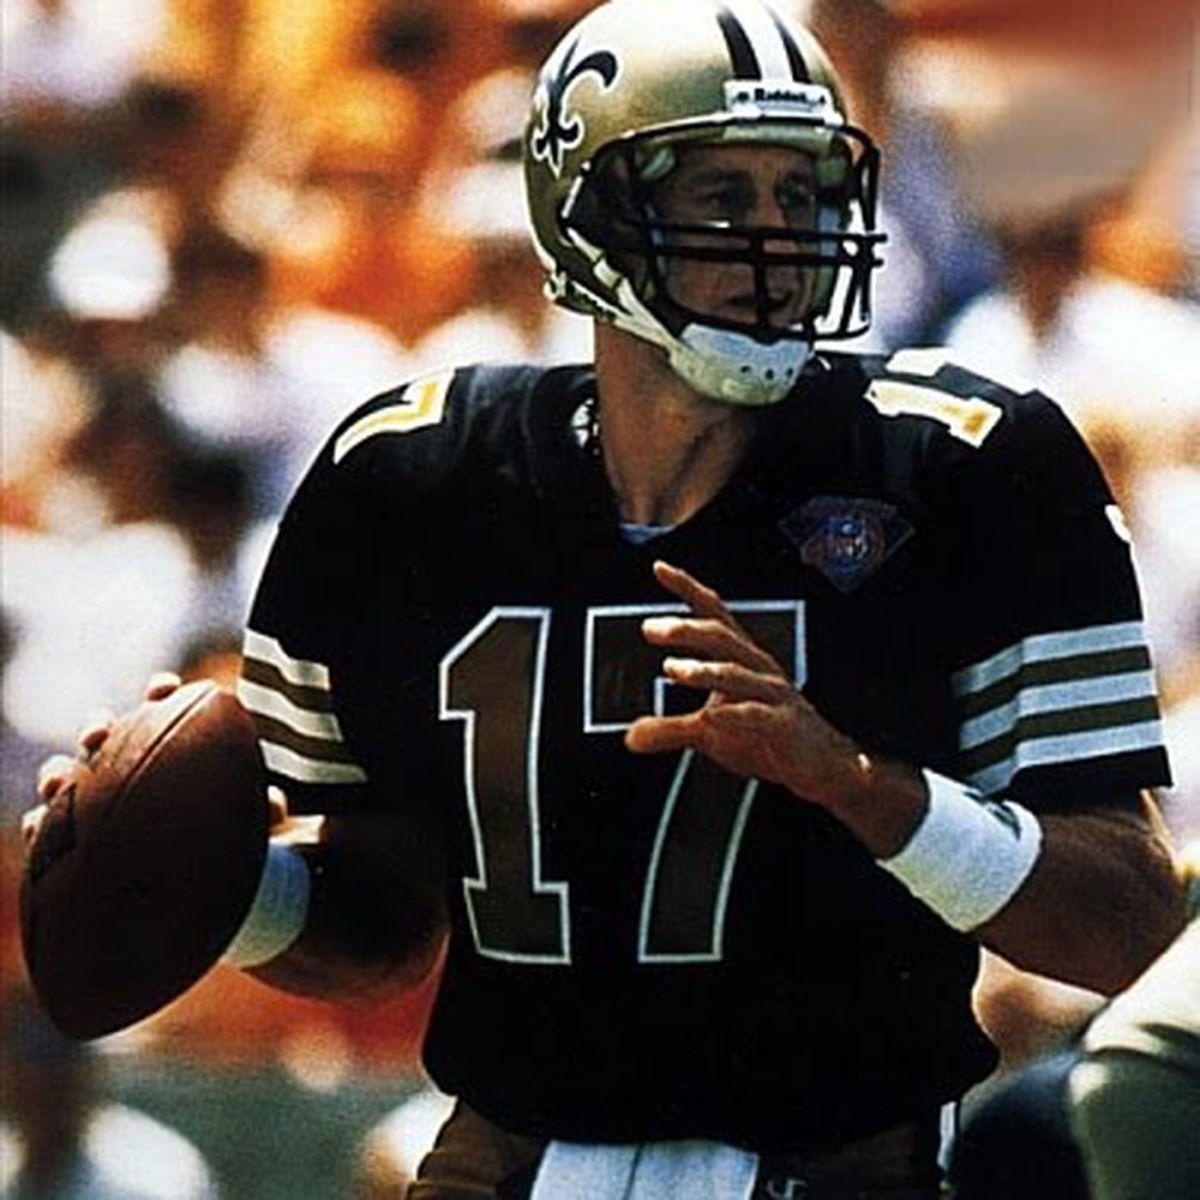 Former New Orleans Saints quarterback Jim Everett (via Twitter)